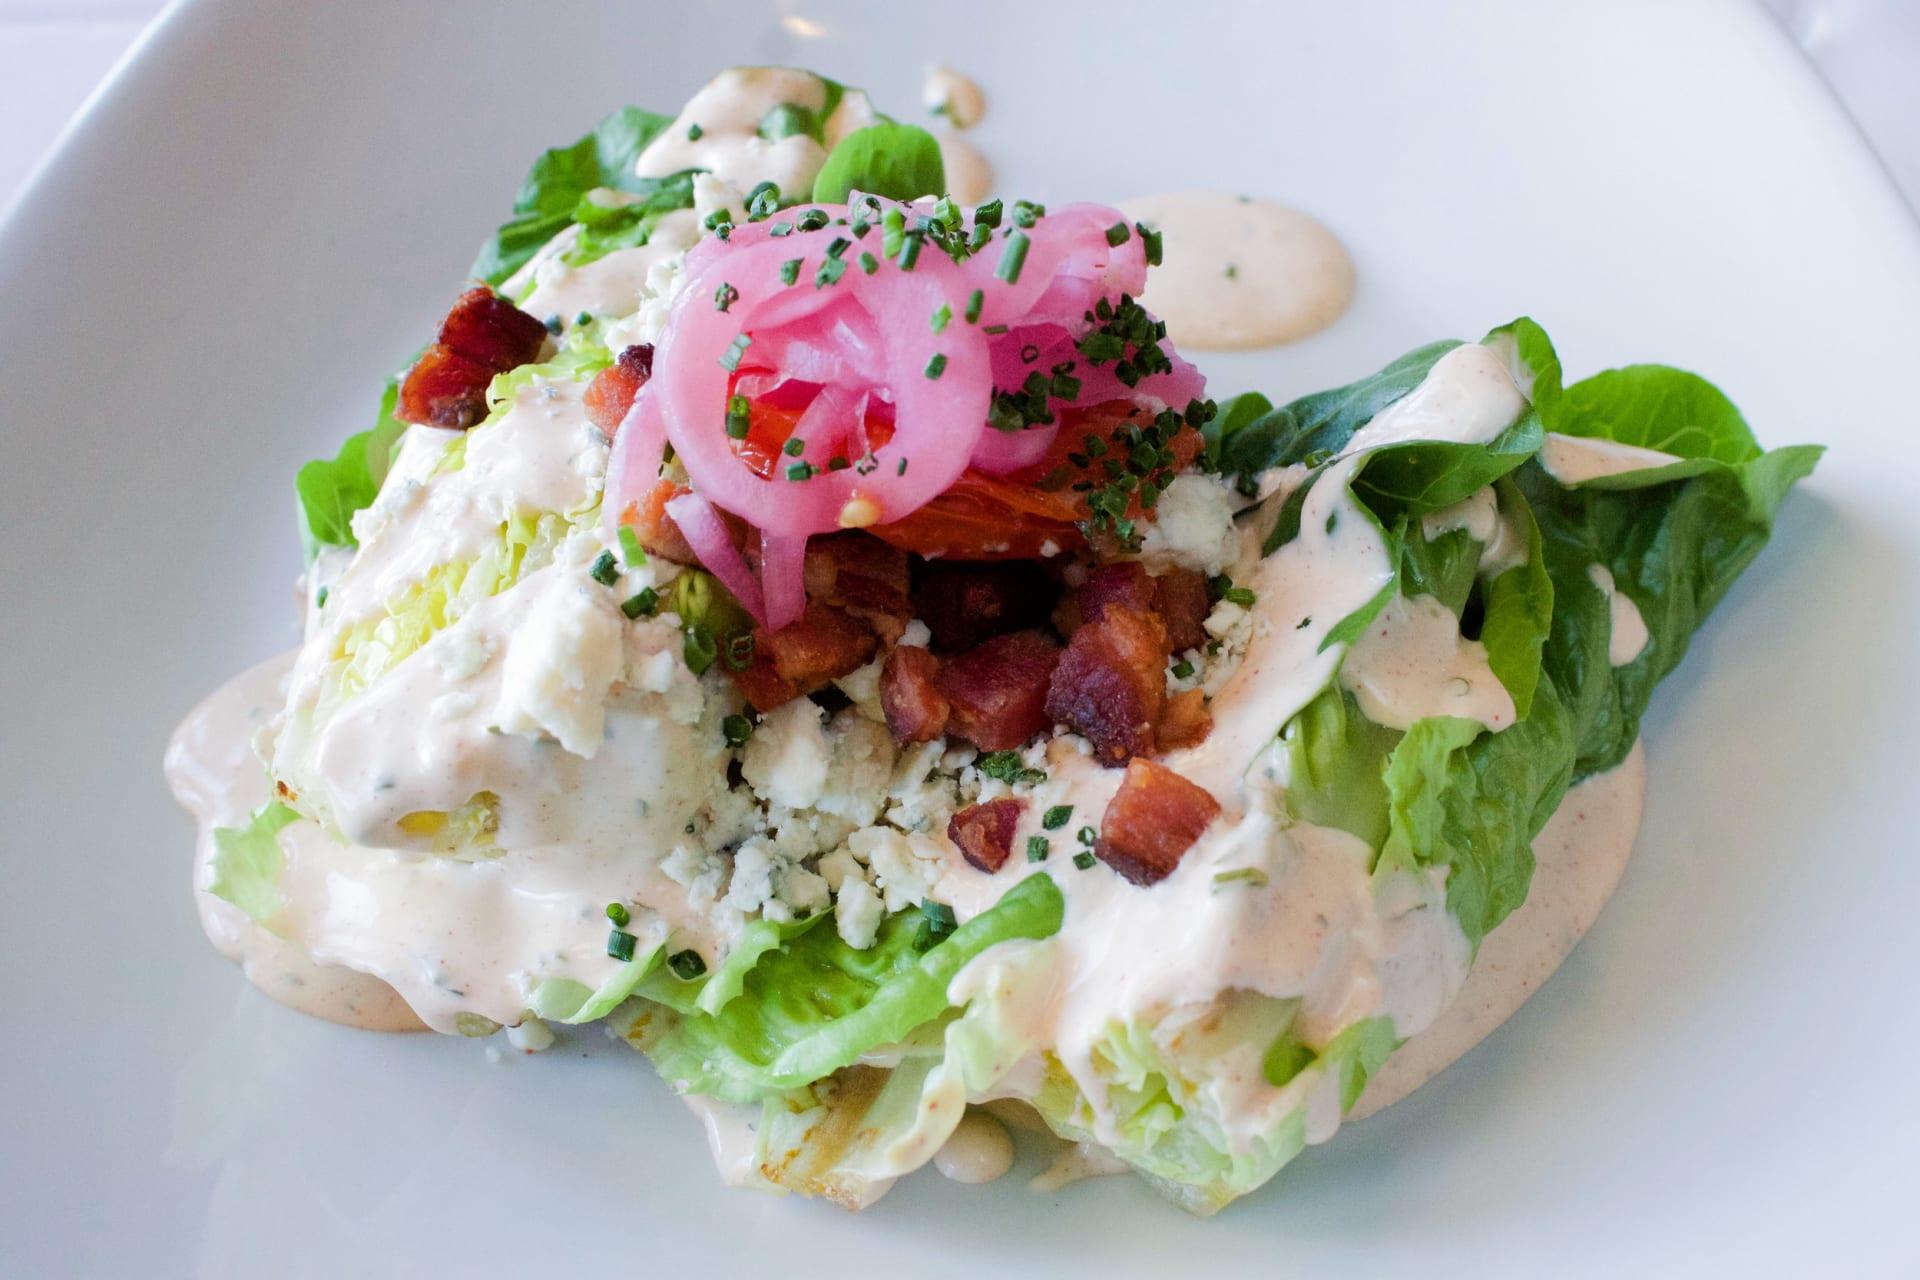 Close up of the Sweet Gem Lettuce Wedge salad